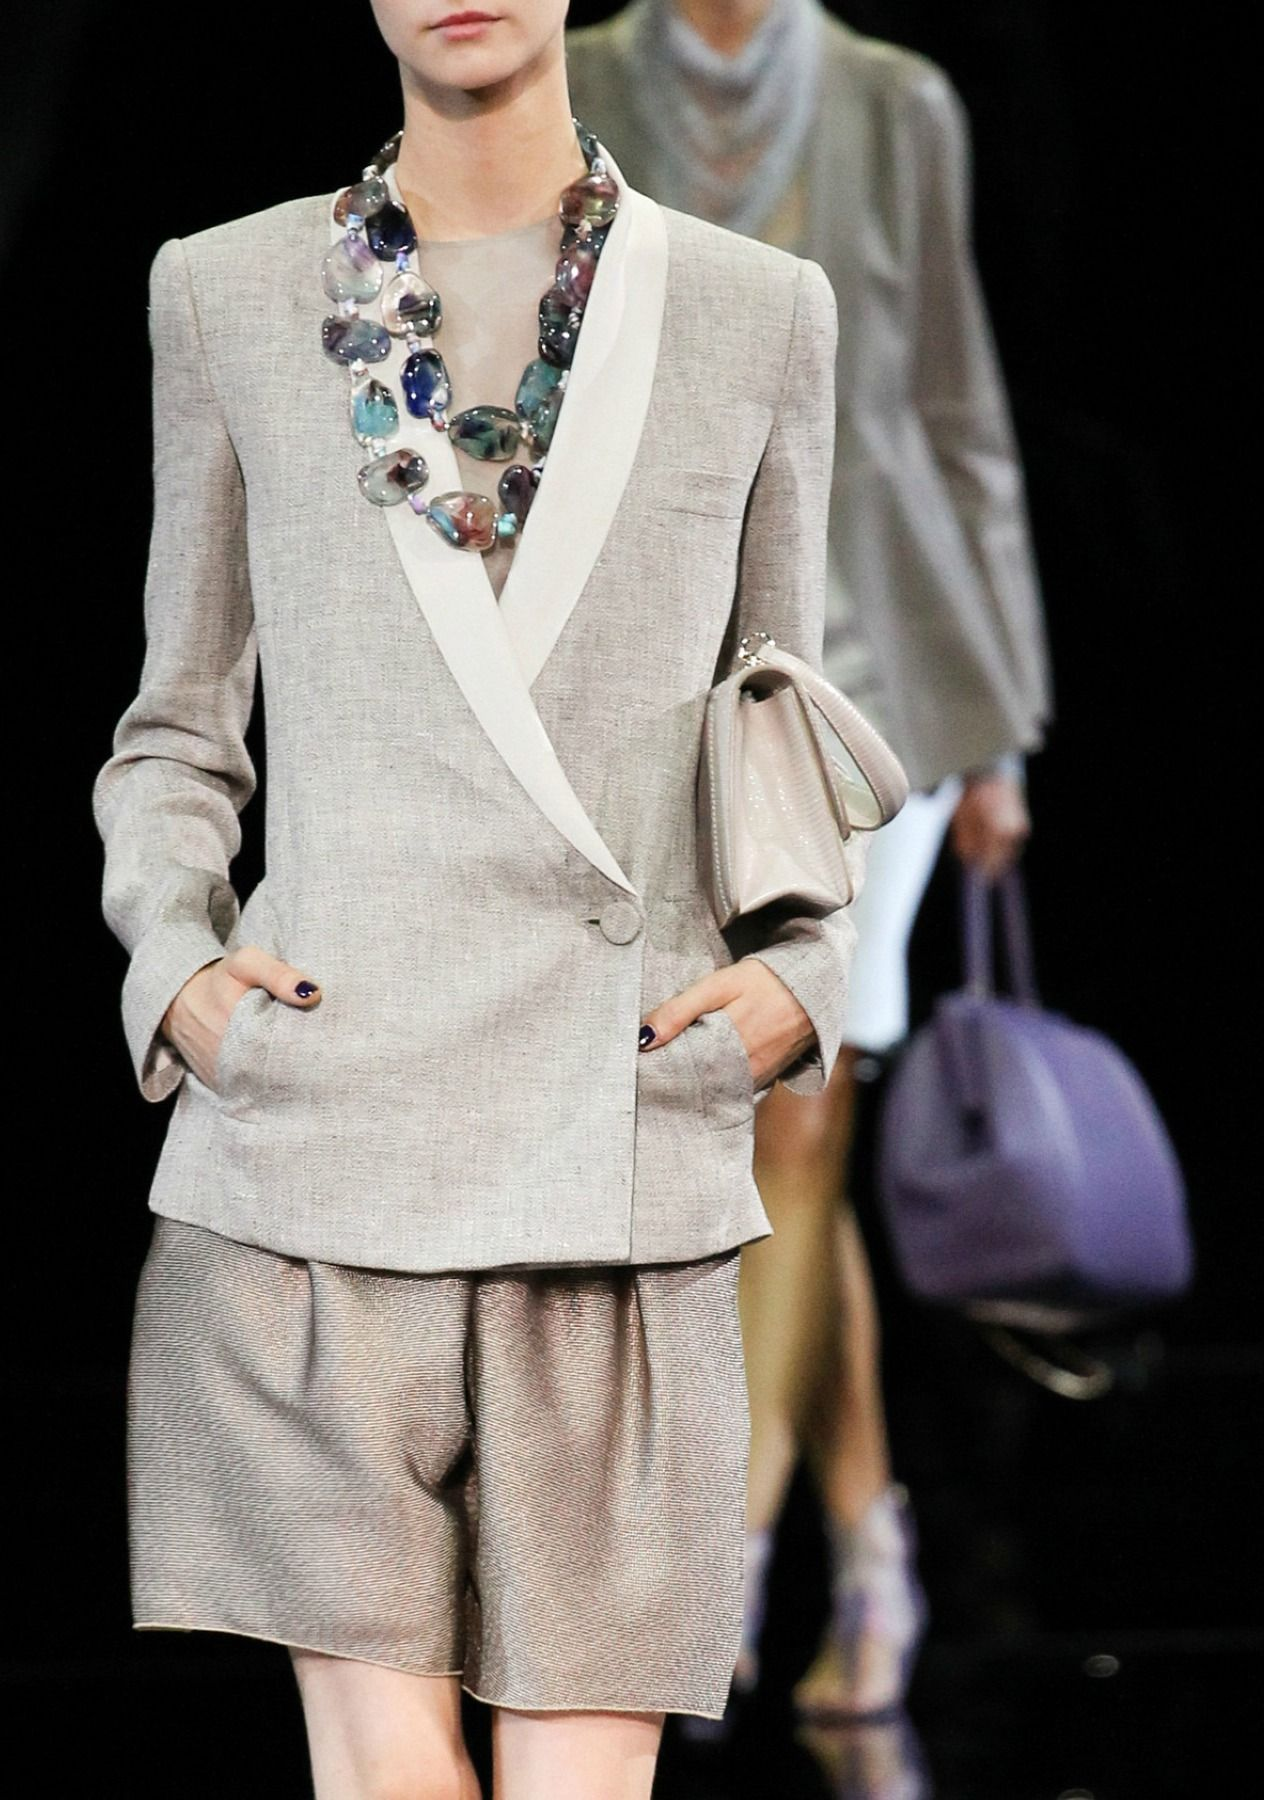 kiana house of fashion timeless rayon top with bottom